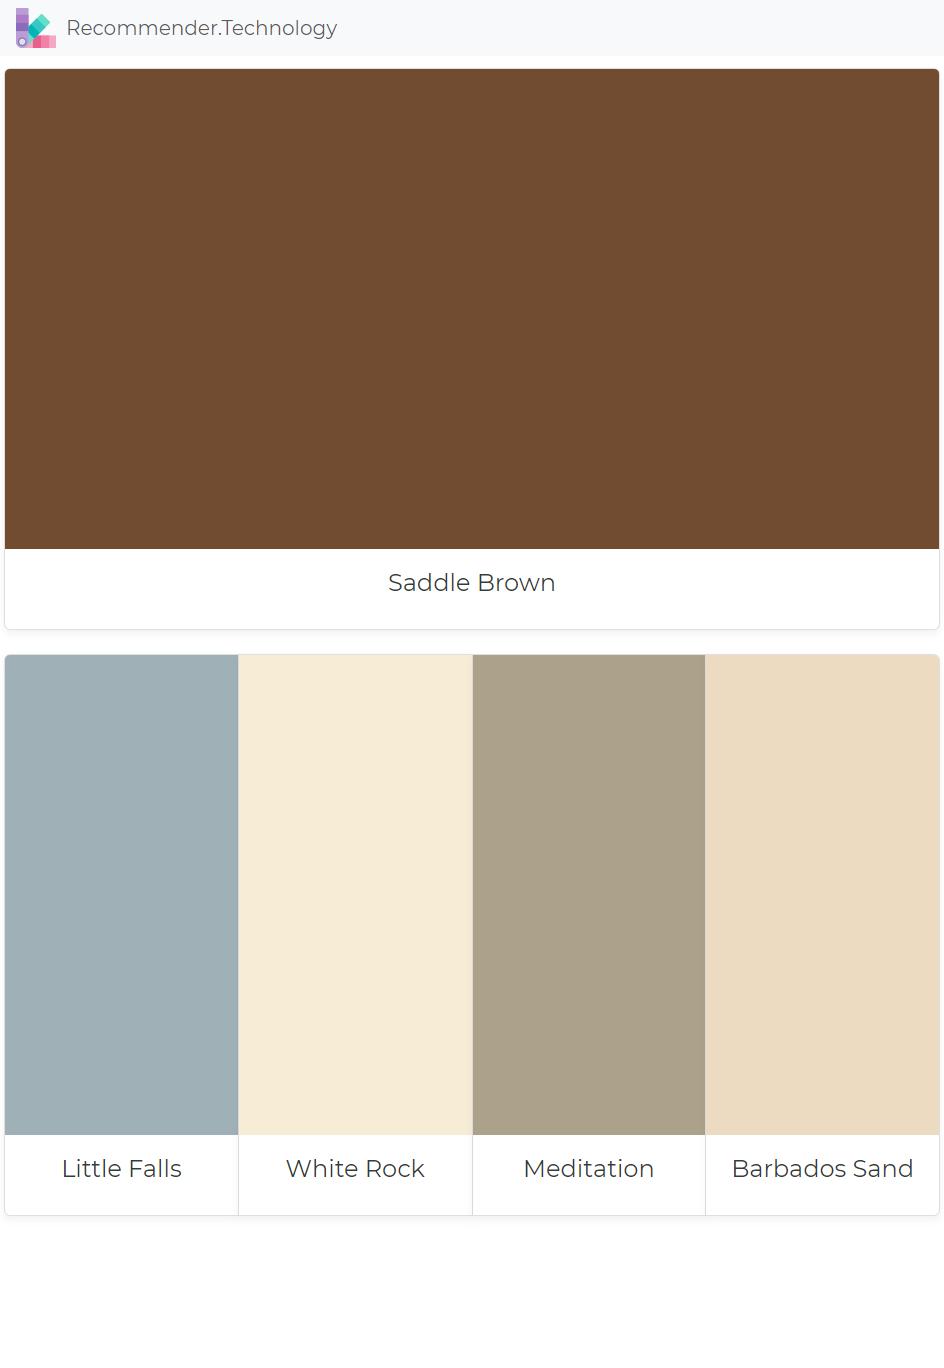 Saddle Brown Little Falls White Rock Meditation Barbados Sand Paint Color Palettes